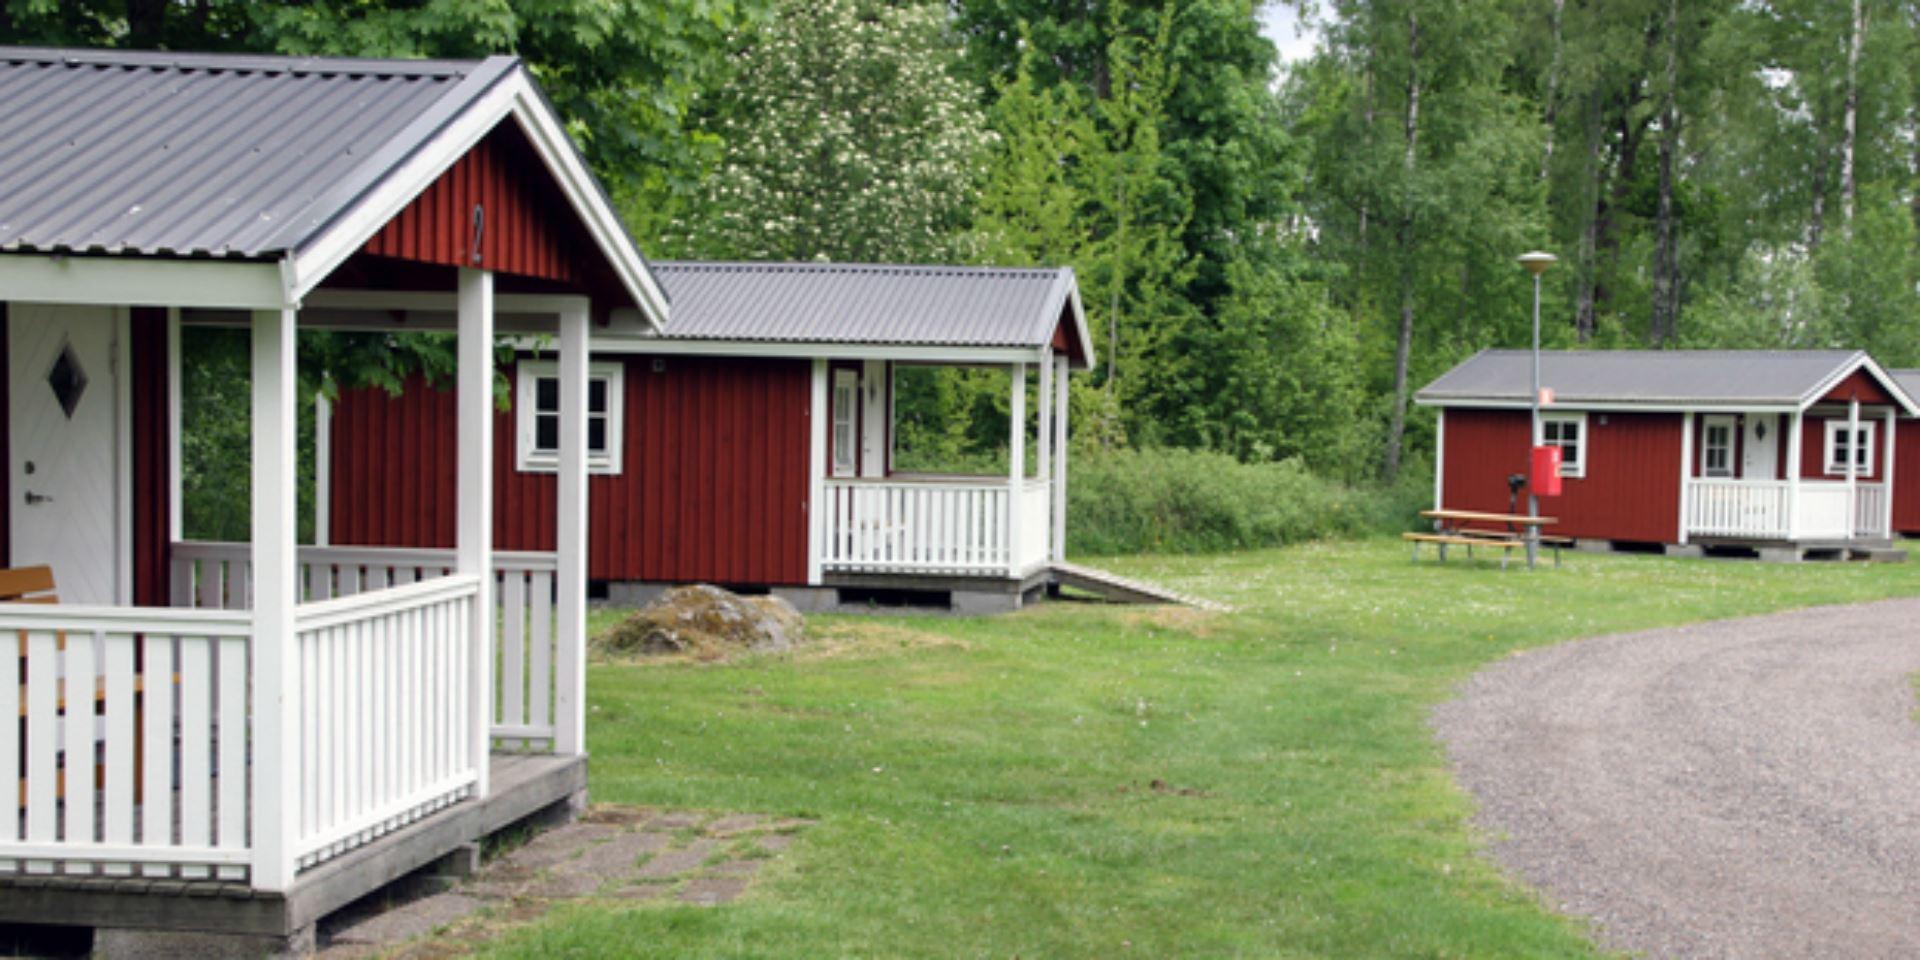 Emmaboda Camping